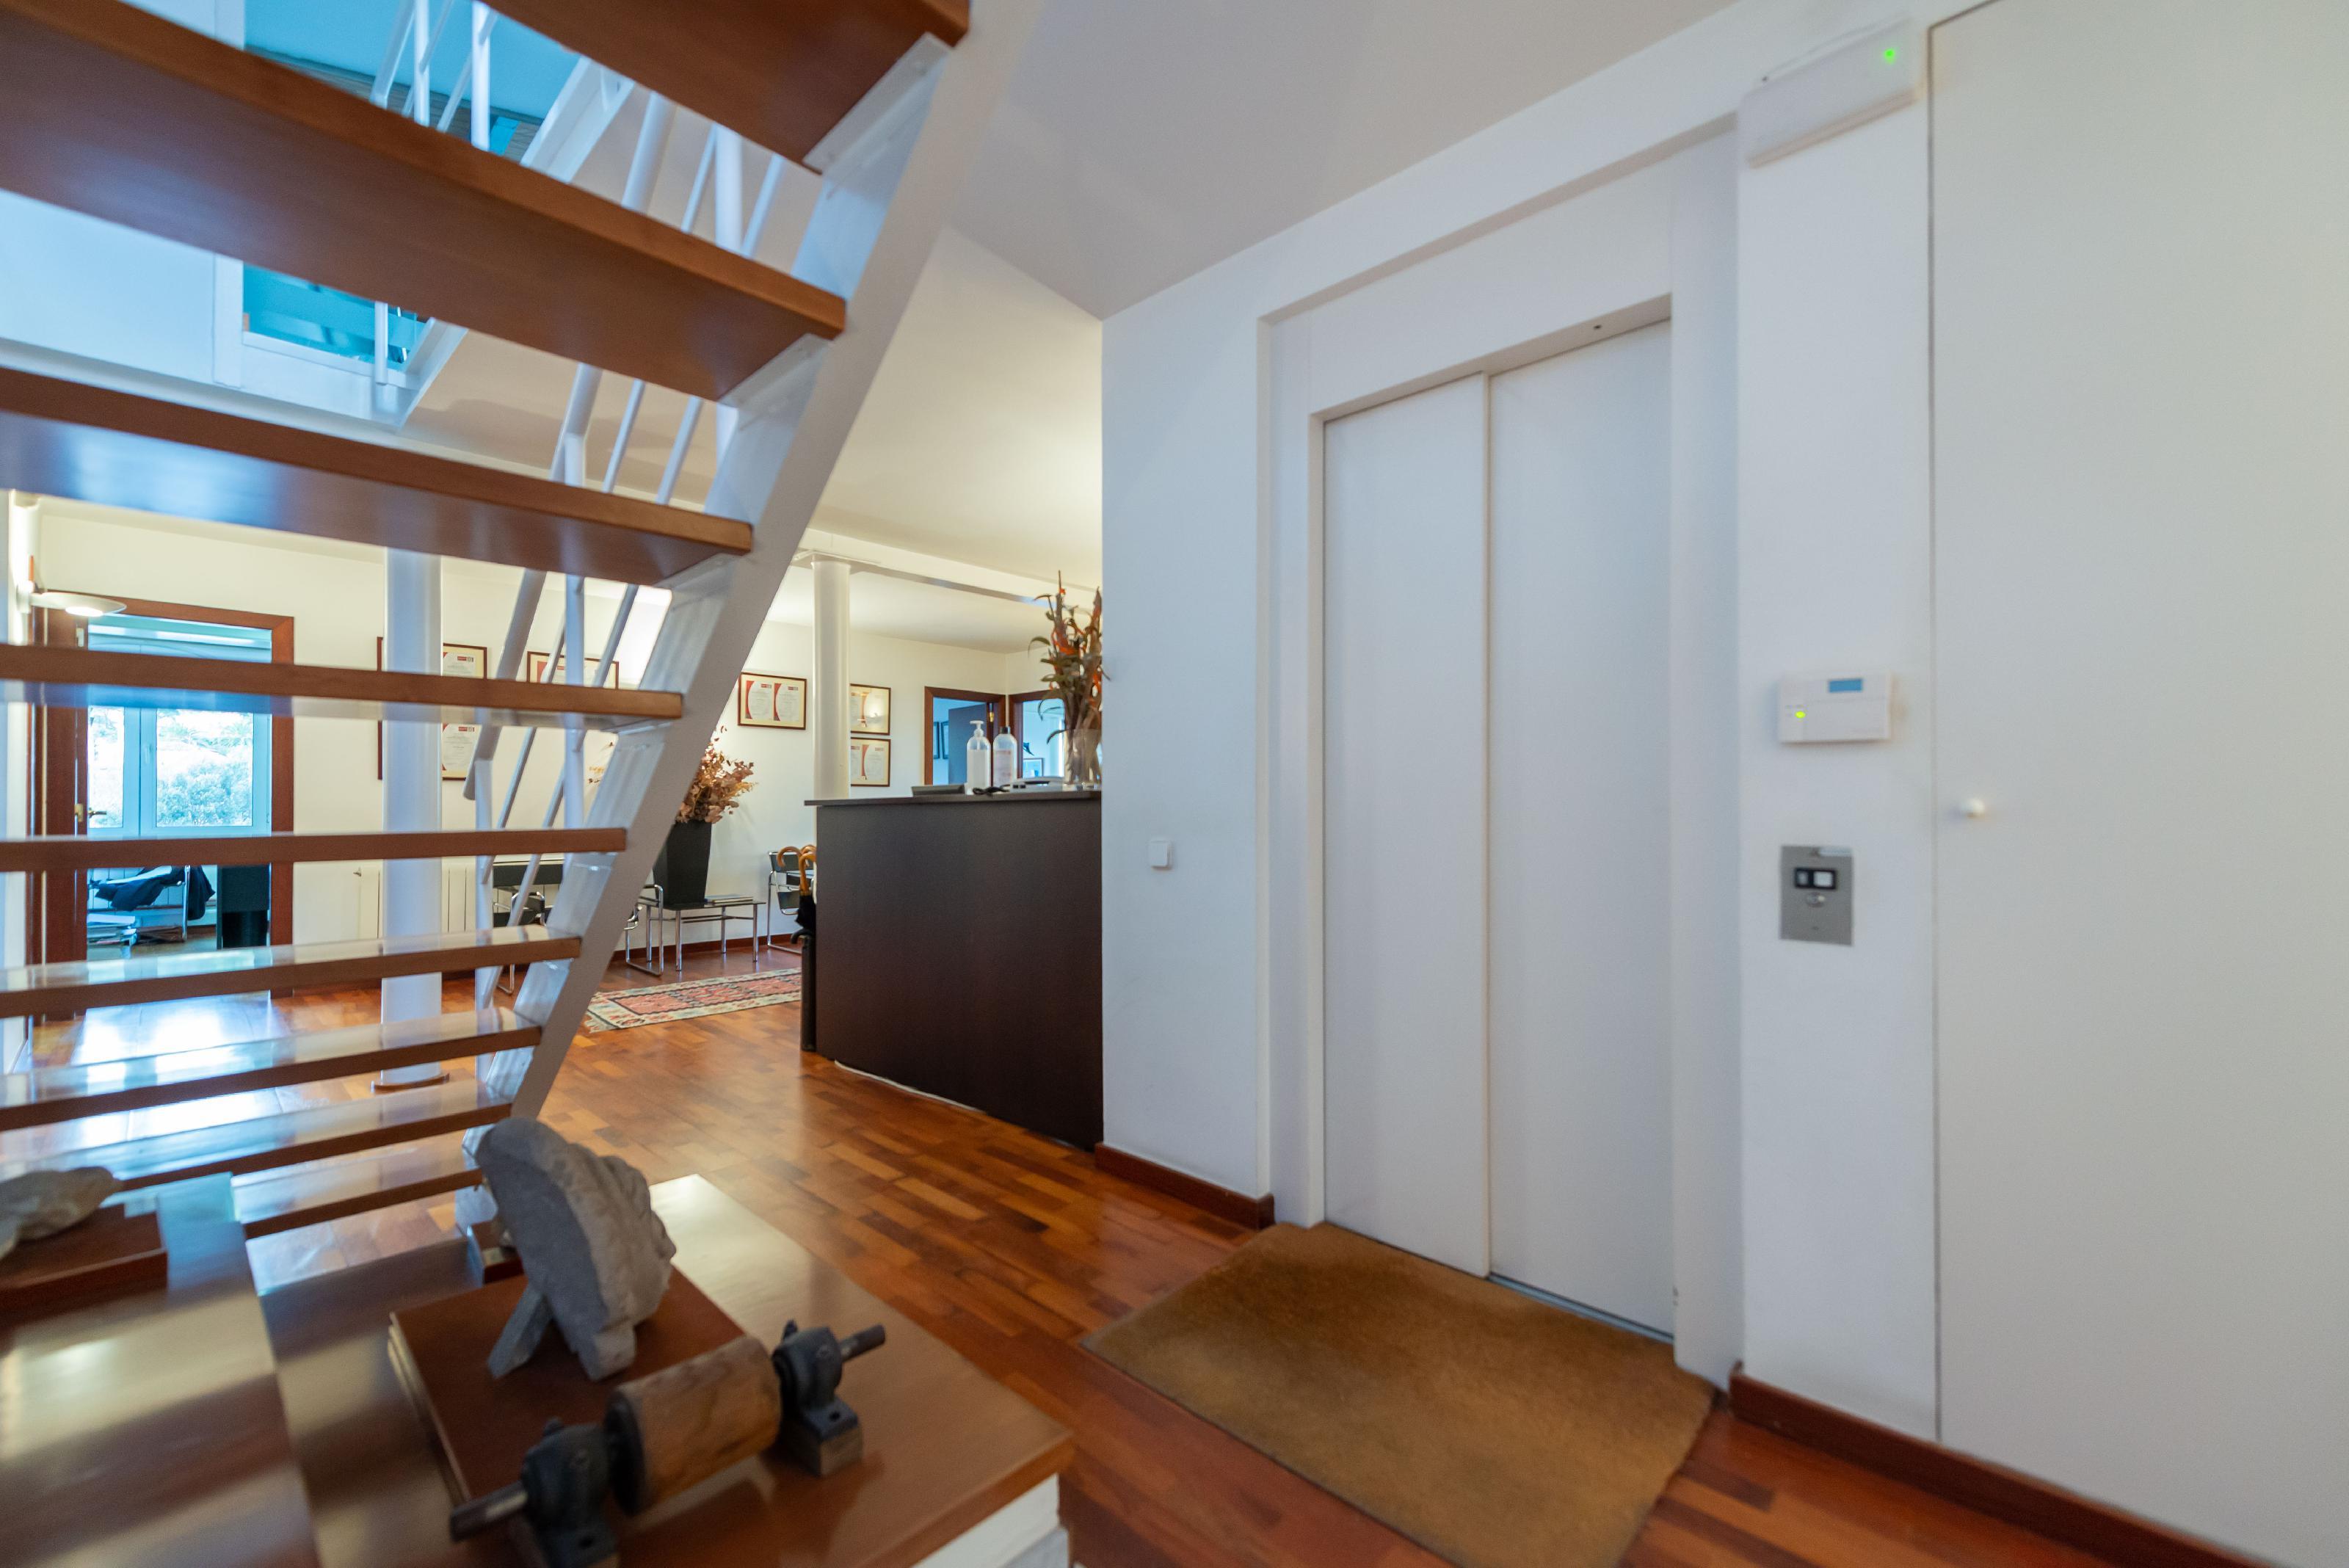 246066 Penthouse for sale in Sarrià-Sant Gervasi, Sarrià 3